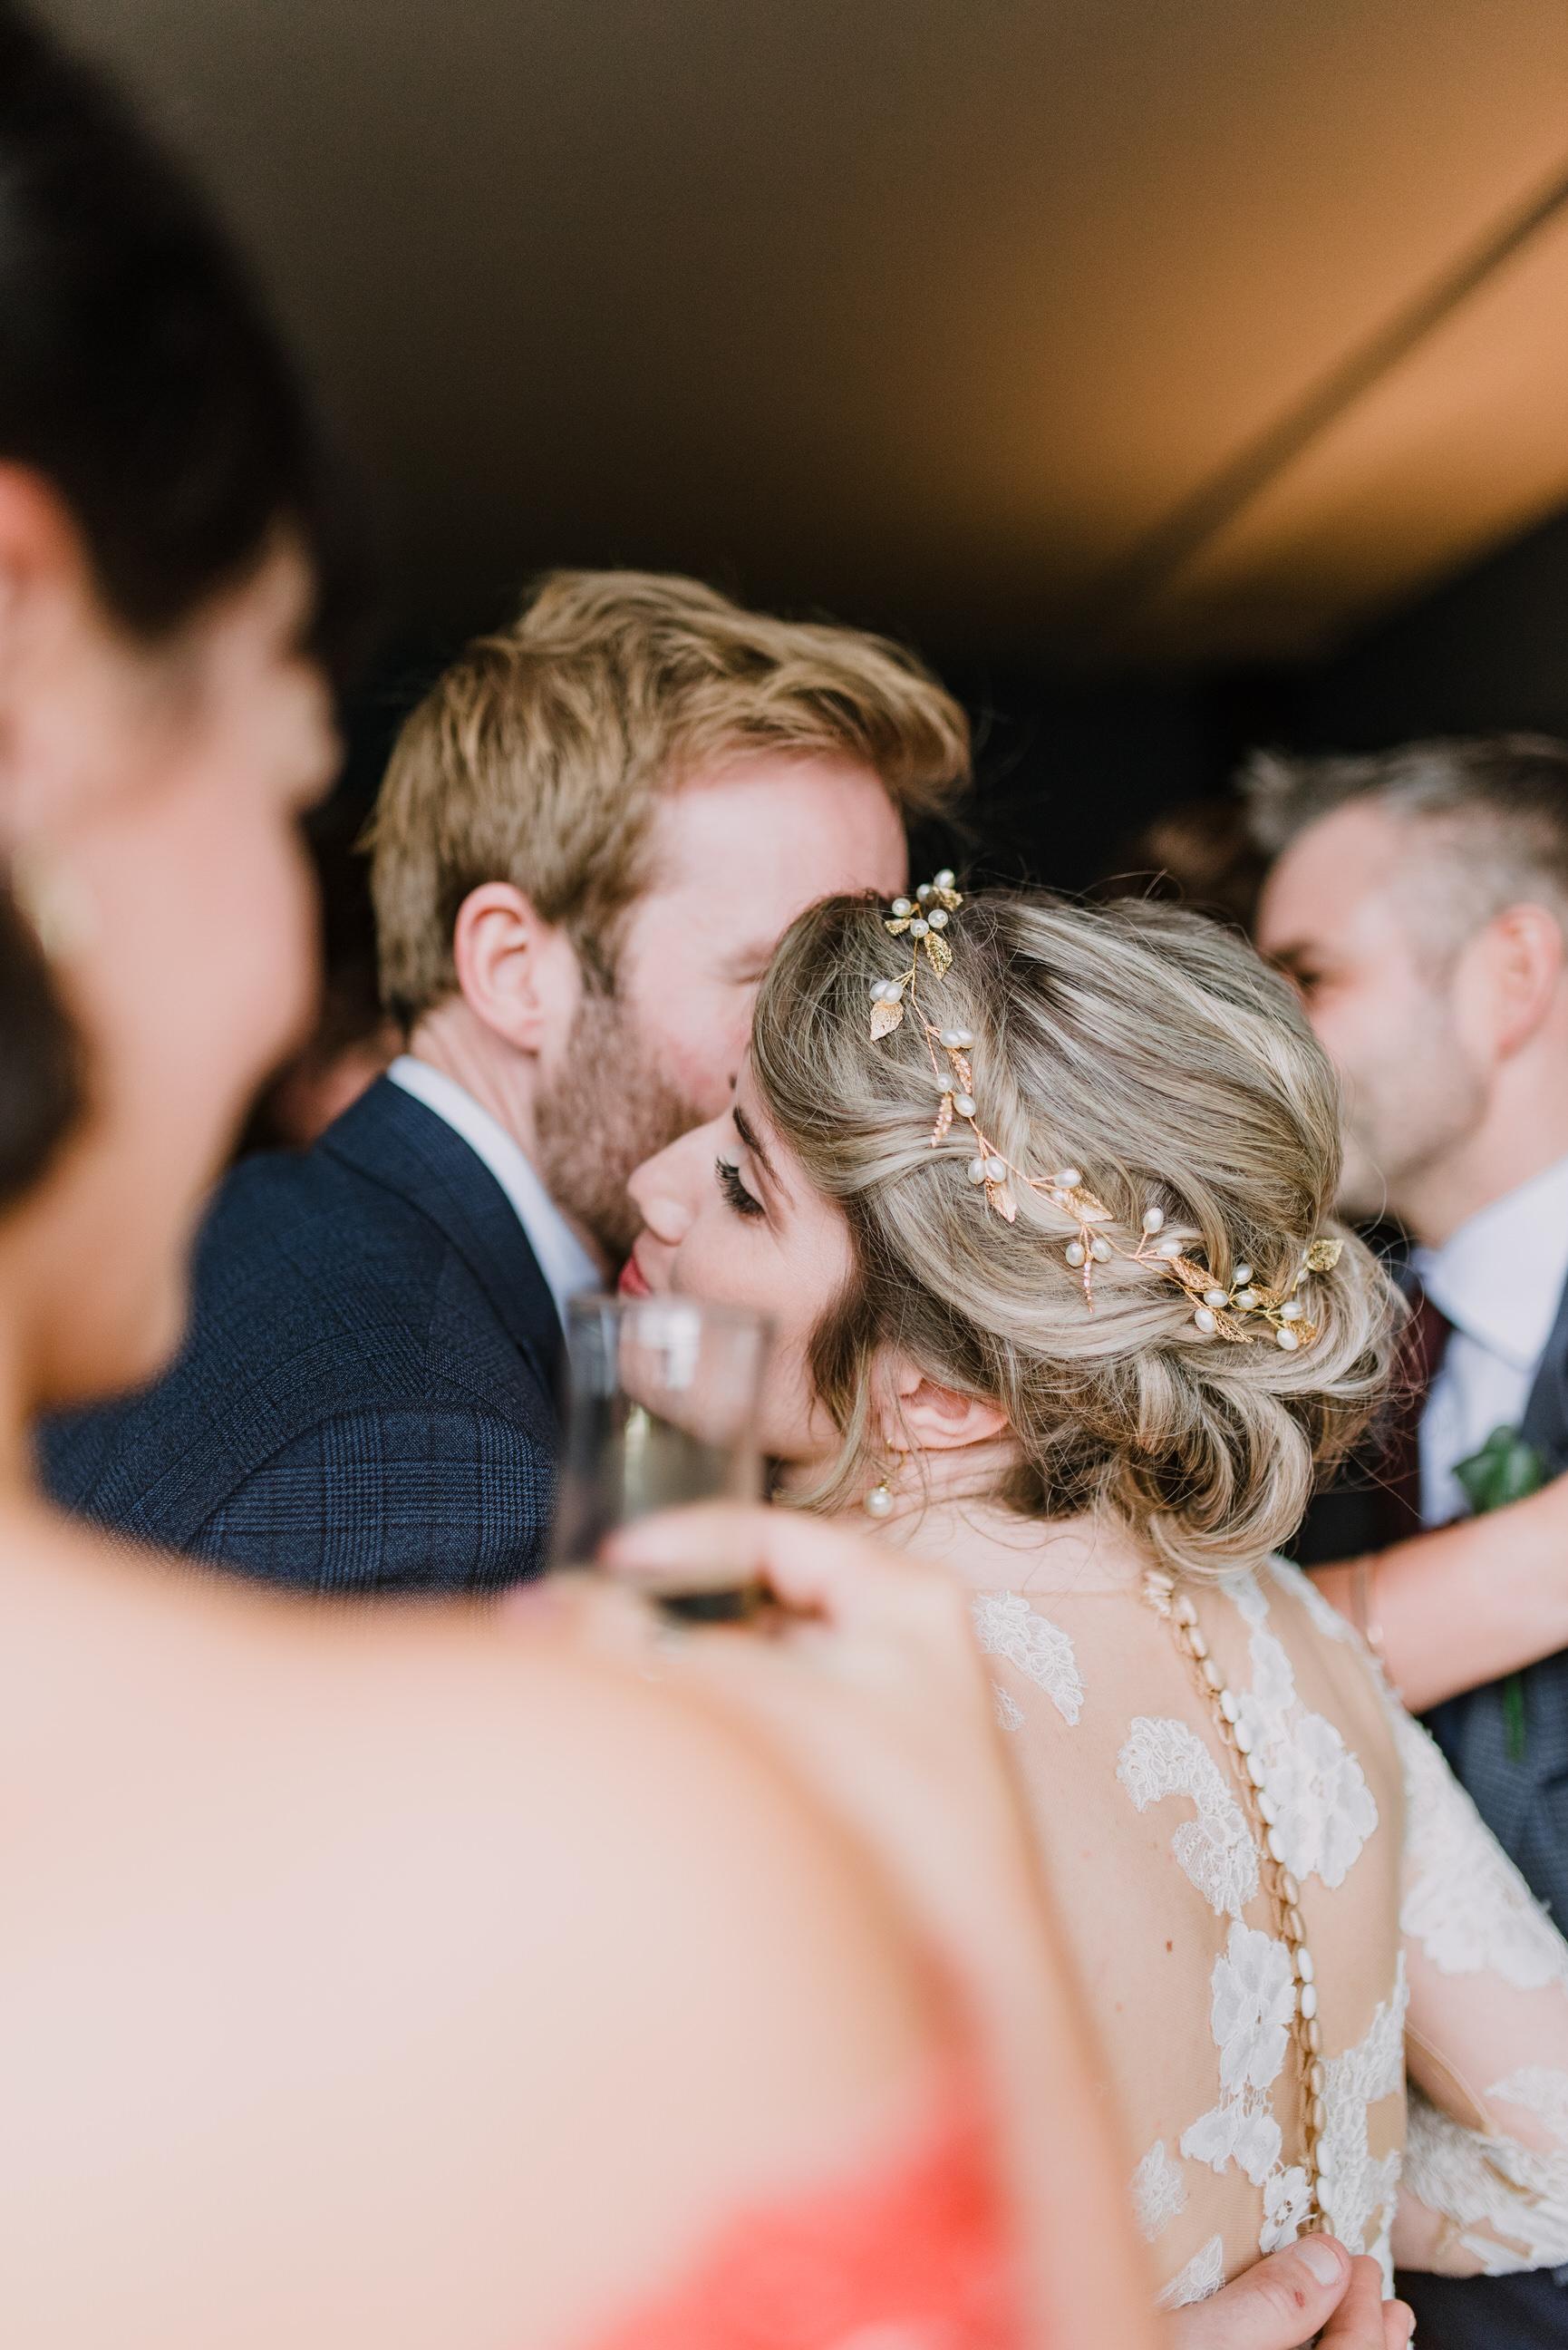 lissanoure castle wedding, northern ireland wedding photographer, romantic northern irish wedding venue, castle wedding ireland, natural wedding photography ni (73).jpg